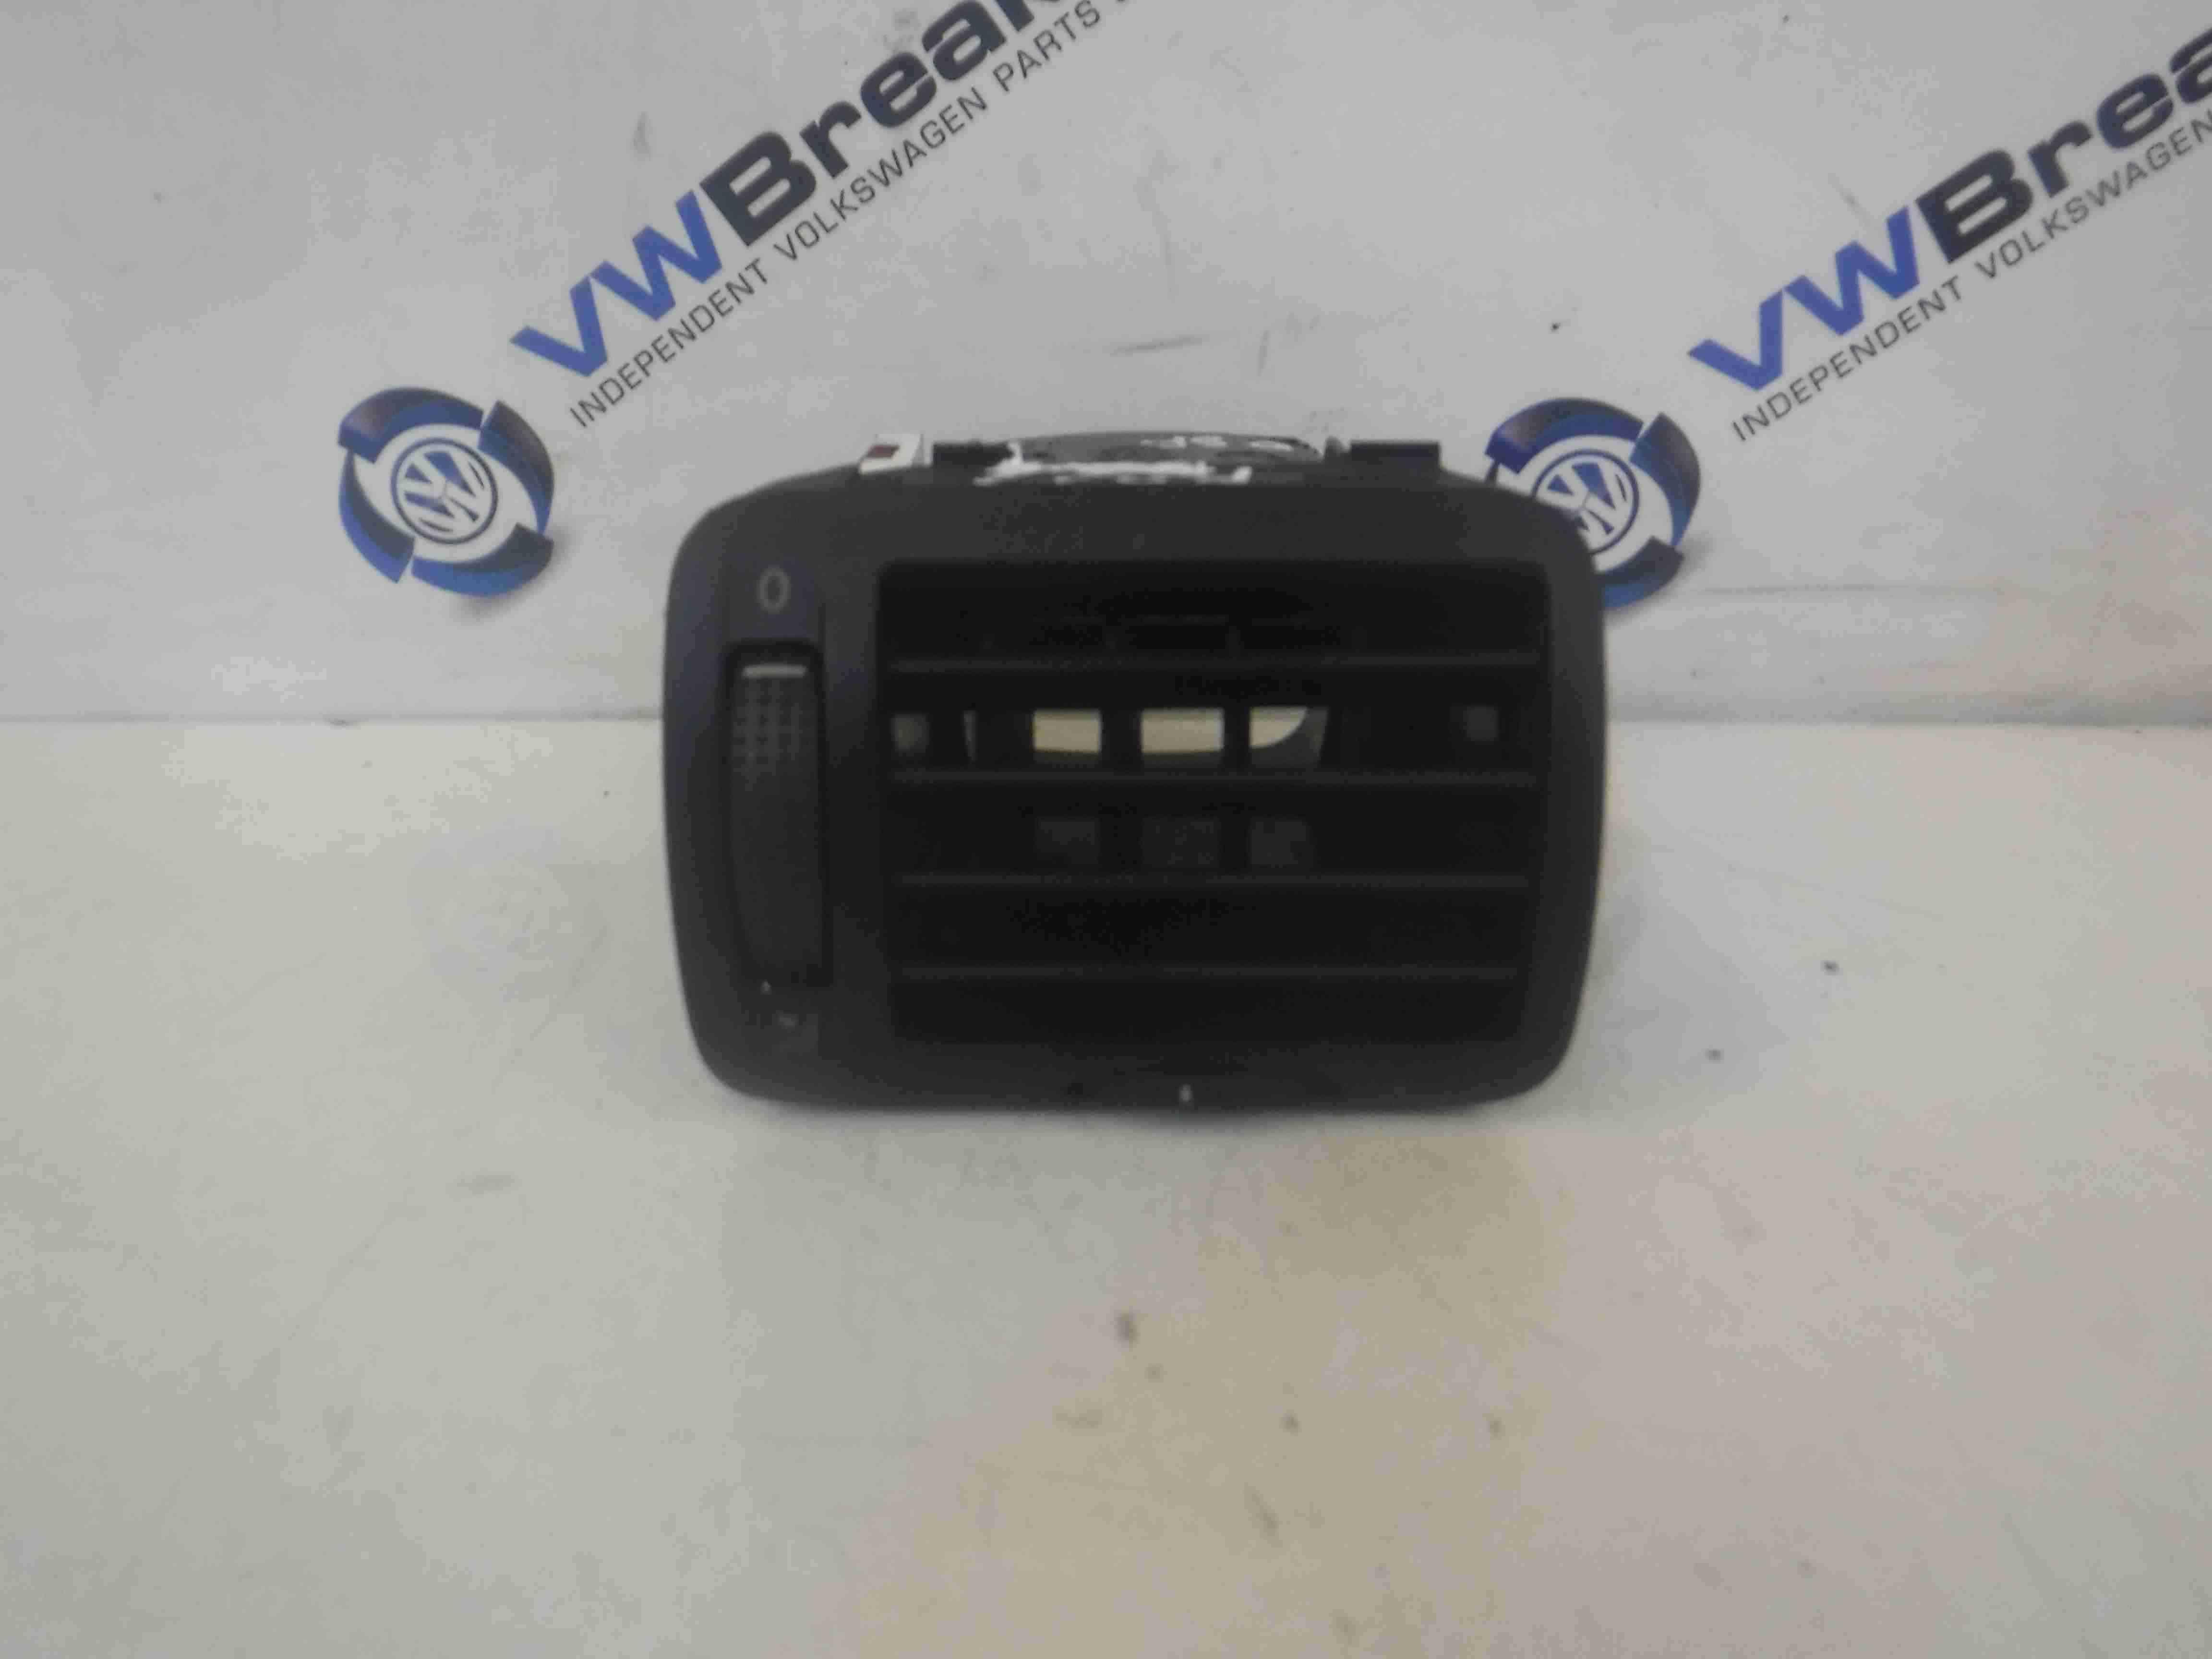 Volkswagen Passat B5.5 2001-2005 B5.5 Drivers NSF Front Heater Vent 5B0819703D